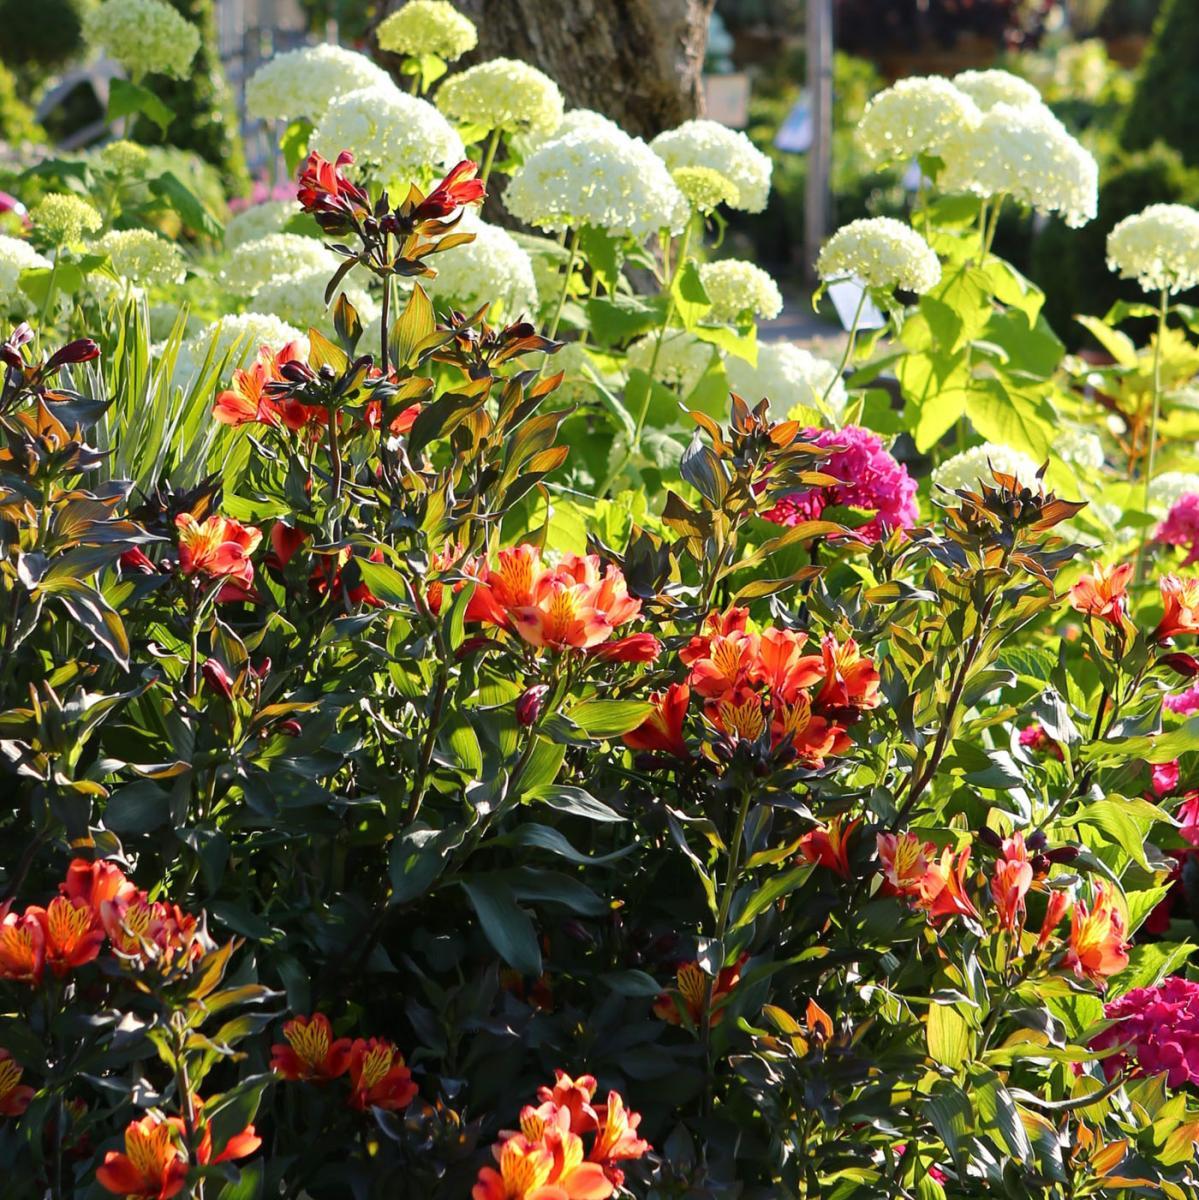 Hydrangea arborescens Annabelle Hydrangea Annabelle 10L Bush